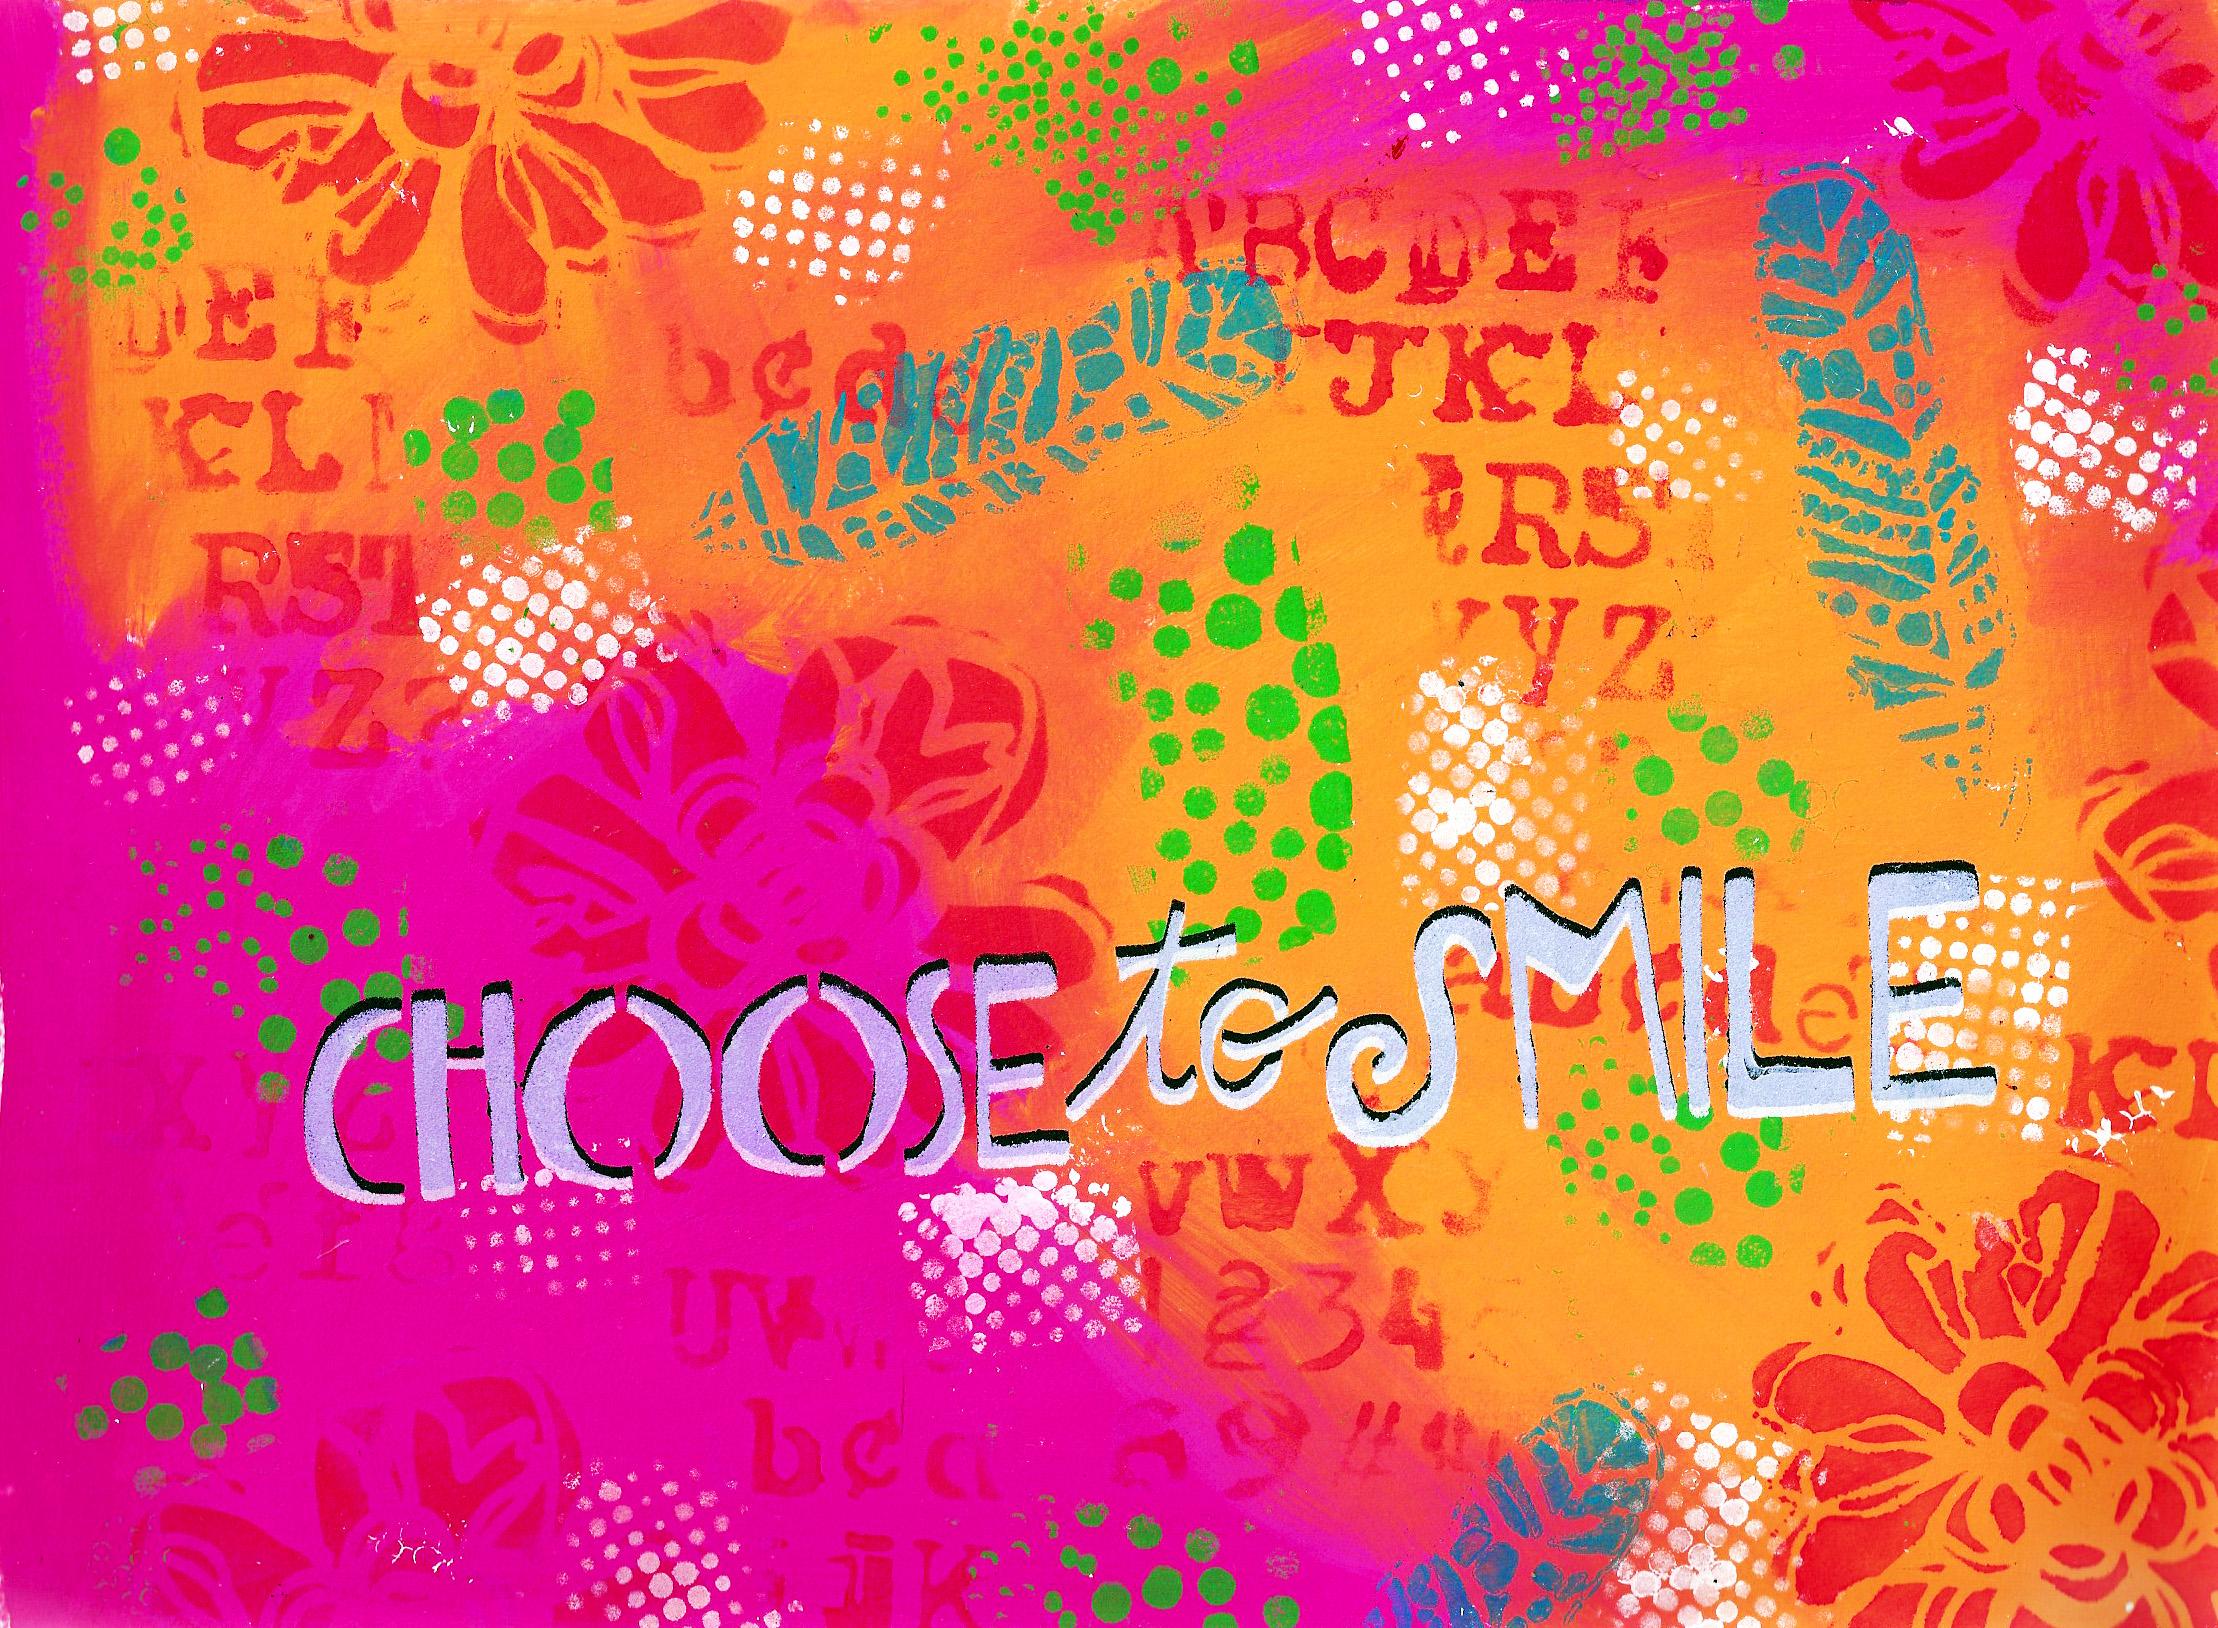 choose to smile